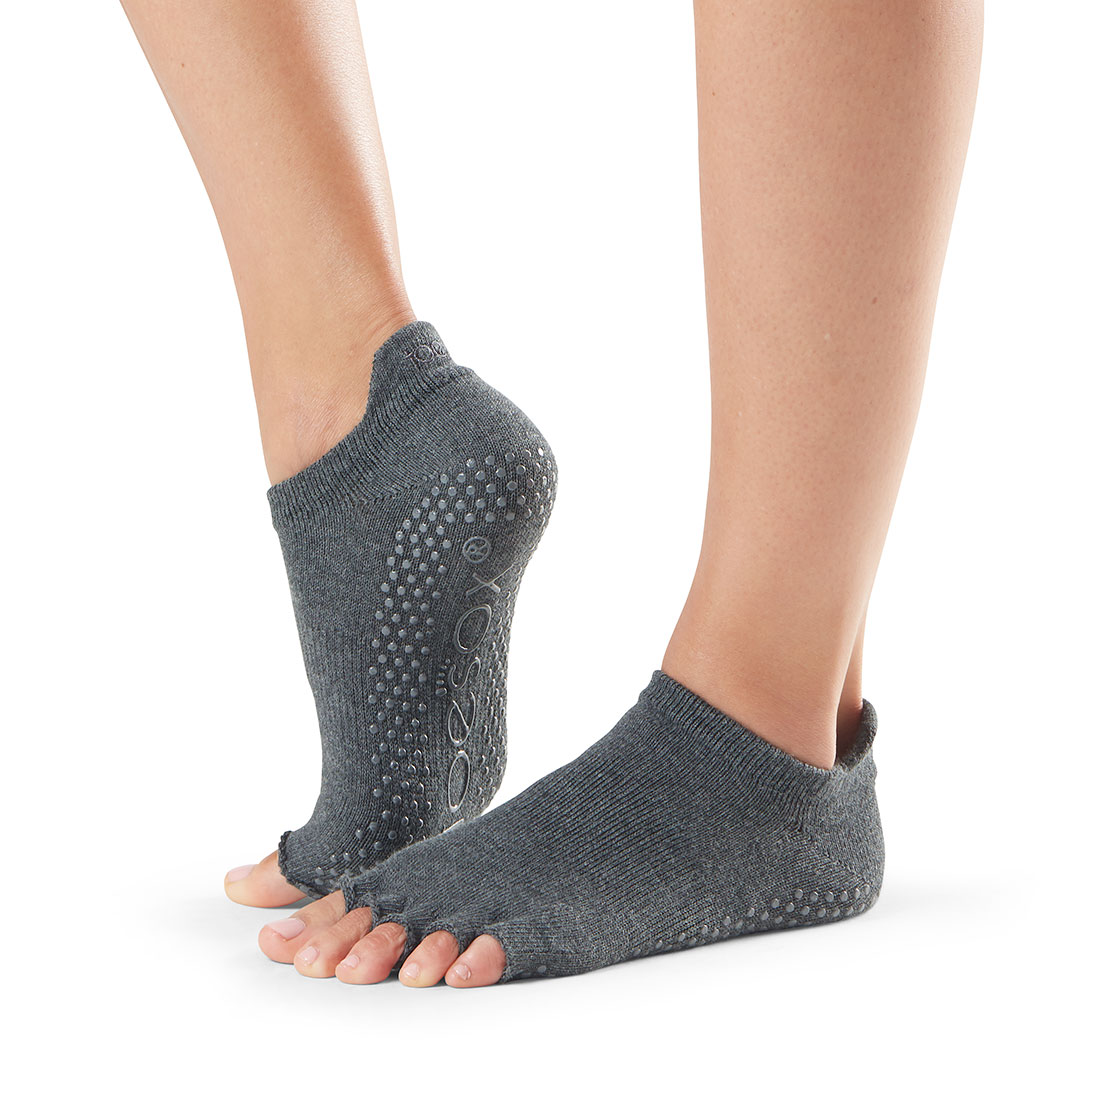 Yogasocken ToeSox Low Rise Half Toe Charcoal Grey - 1